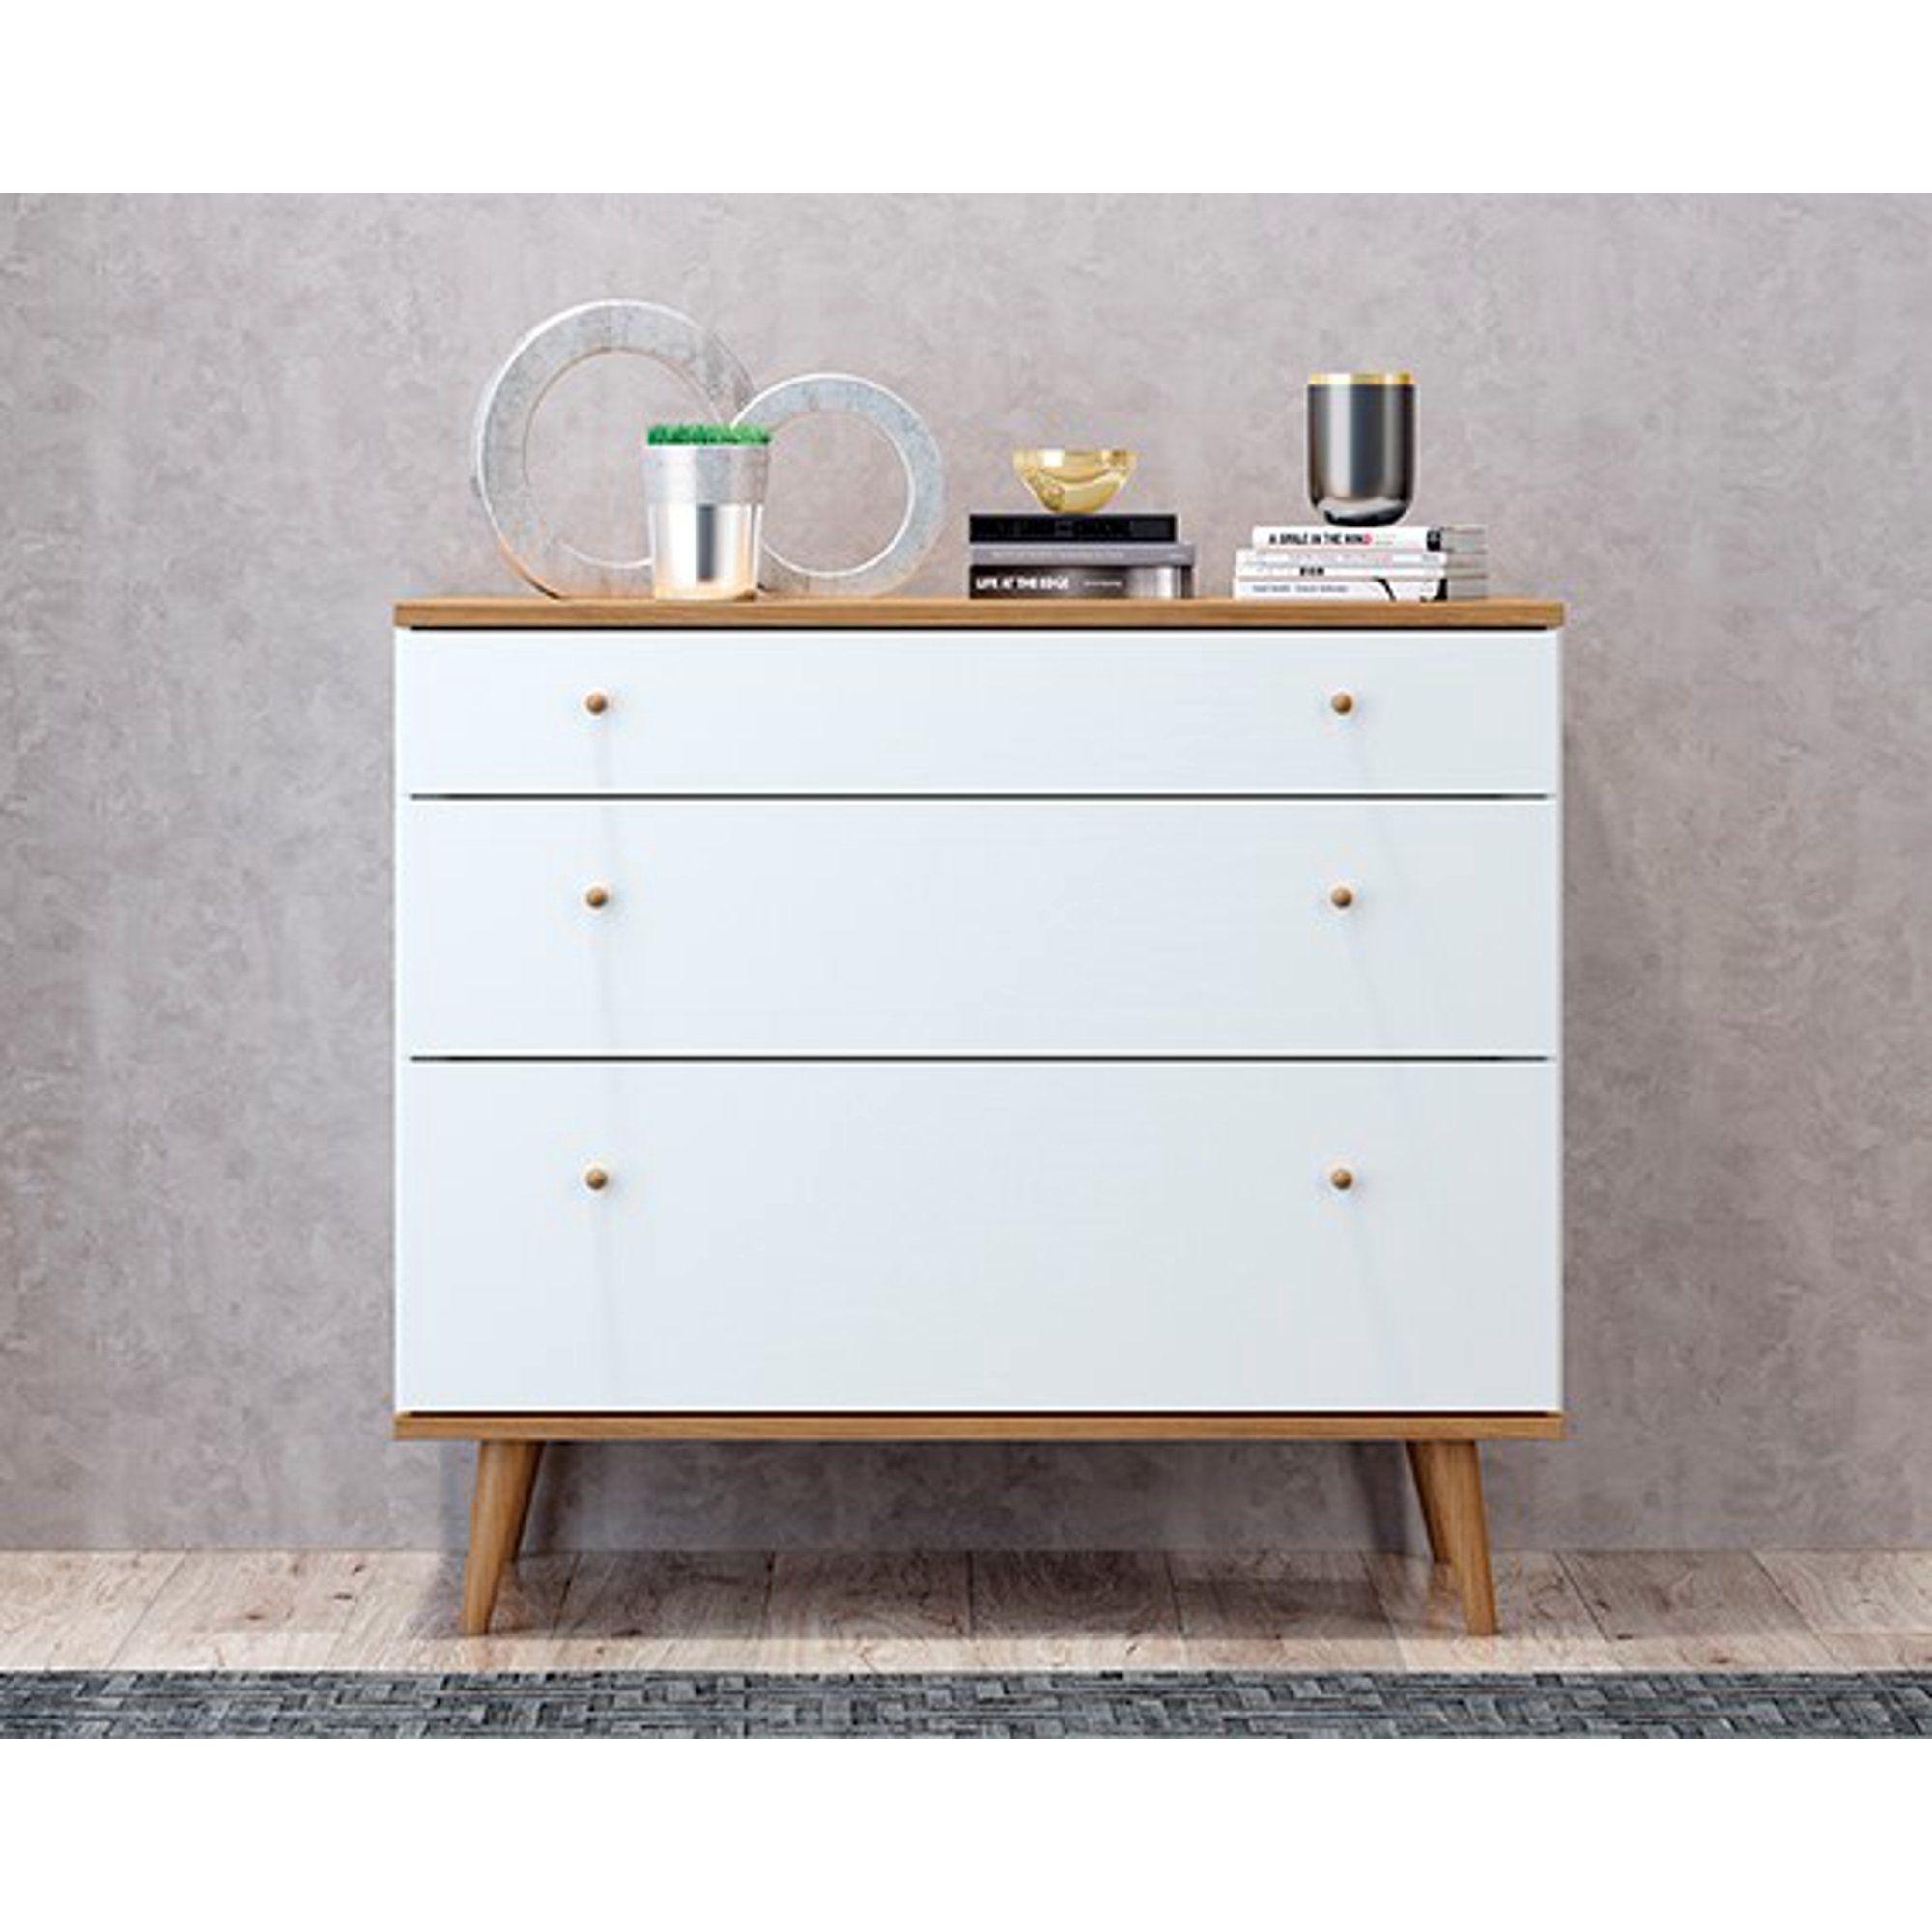 Midtown Concept Oregon 3 Drawer Dresser Walmart Com In 2021 3 Drawer Dresser Dresser Drawers Bedroom Furniture For Sale [ 2000 x 2000 Pixel ]